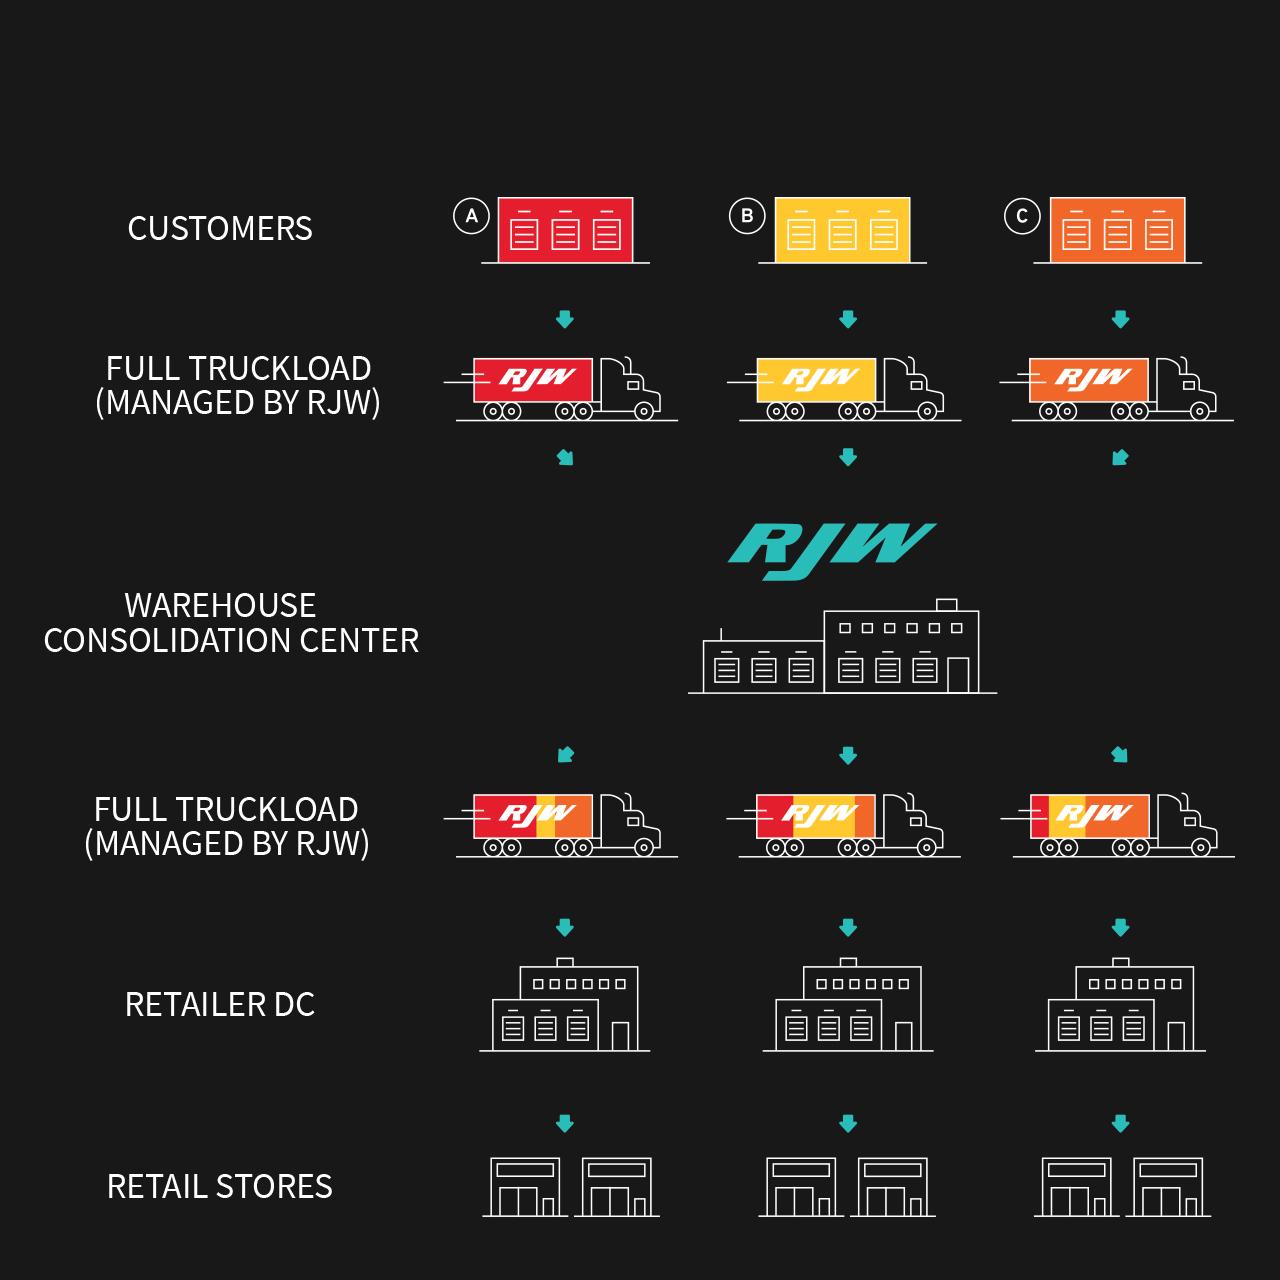 RJW - Retail Consolidation